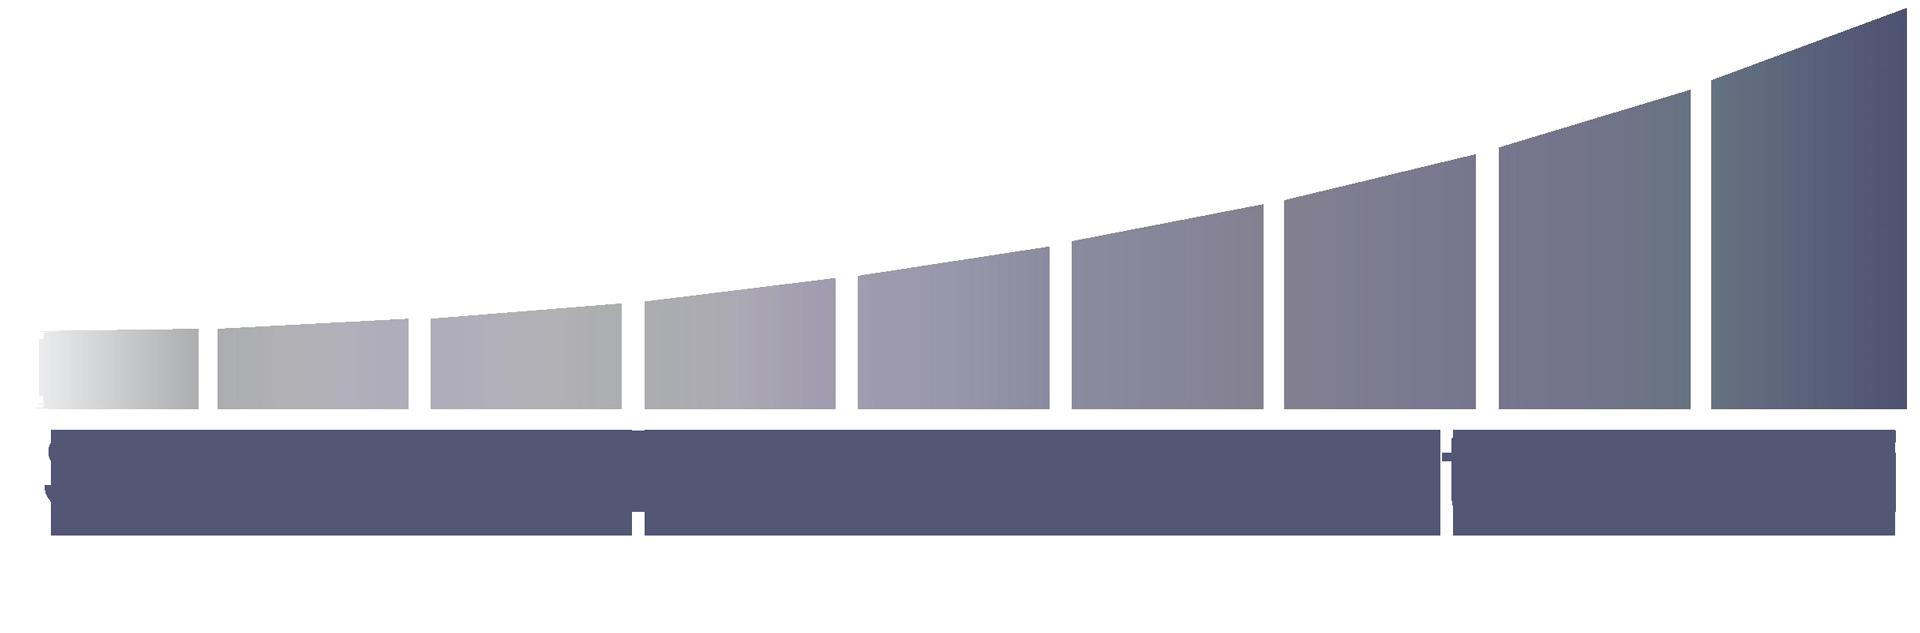 Scuola Bottega Artigiani - Impresa Sociale SRL